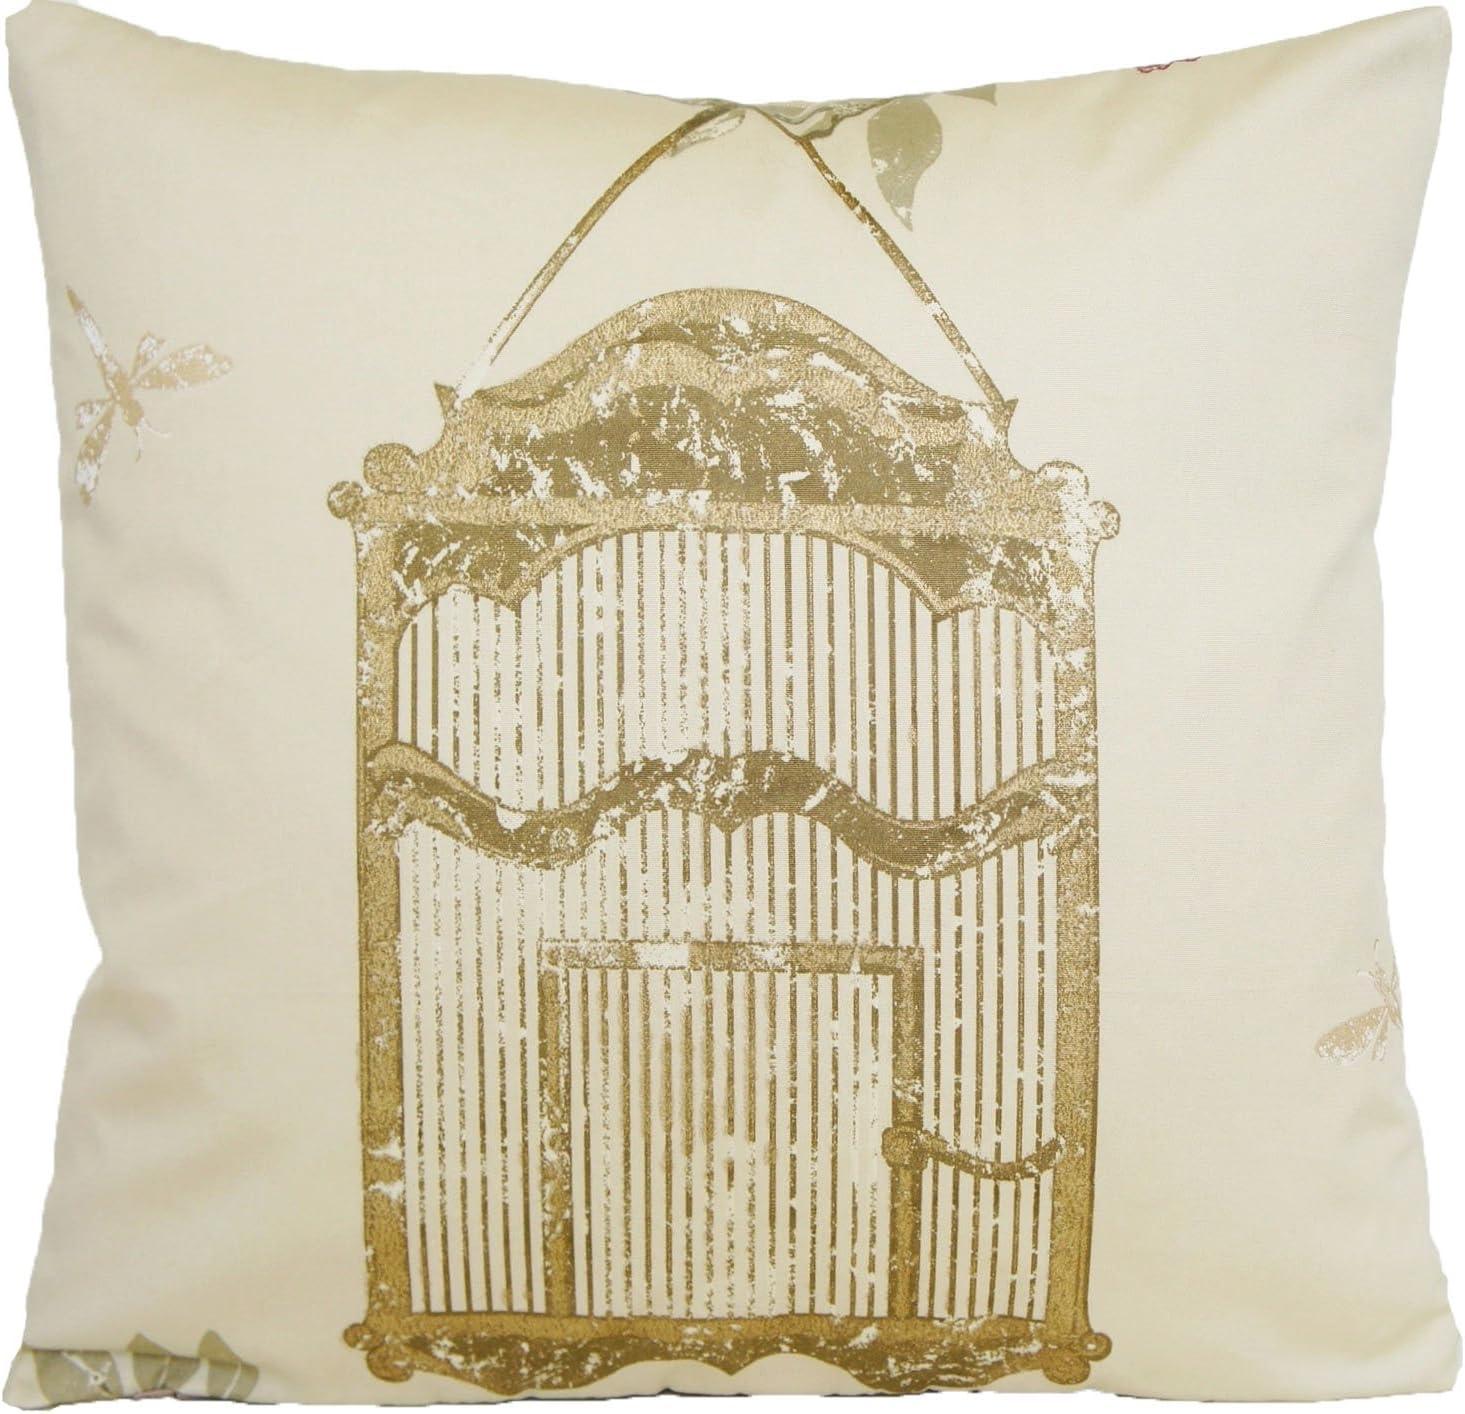 Gold Bird Cage Throw Pillow Case Modern Print Cushion Cover Nina Campbell Fabric Maroon